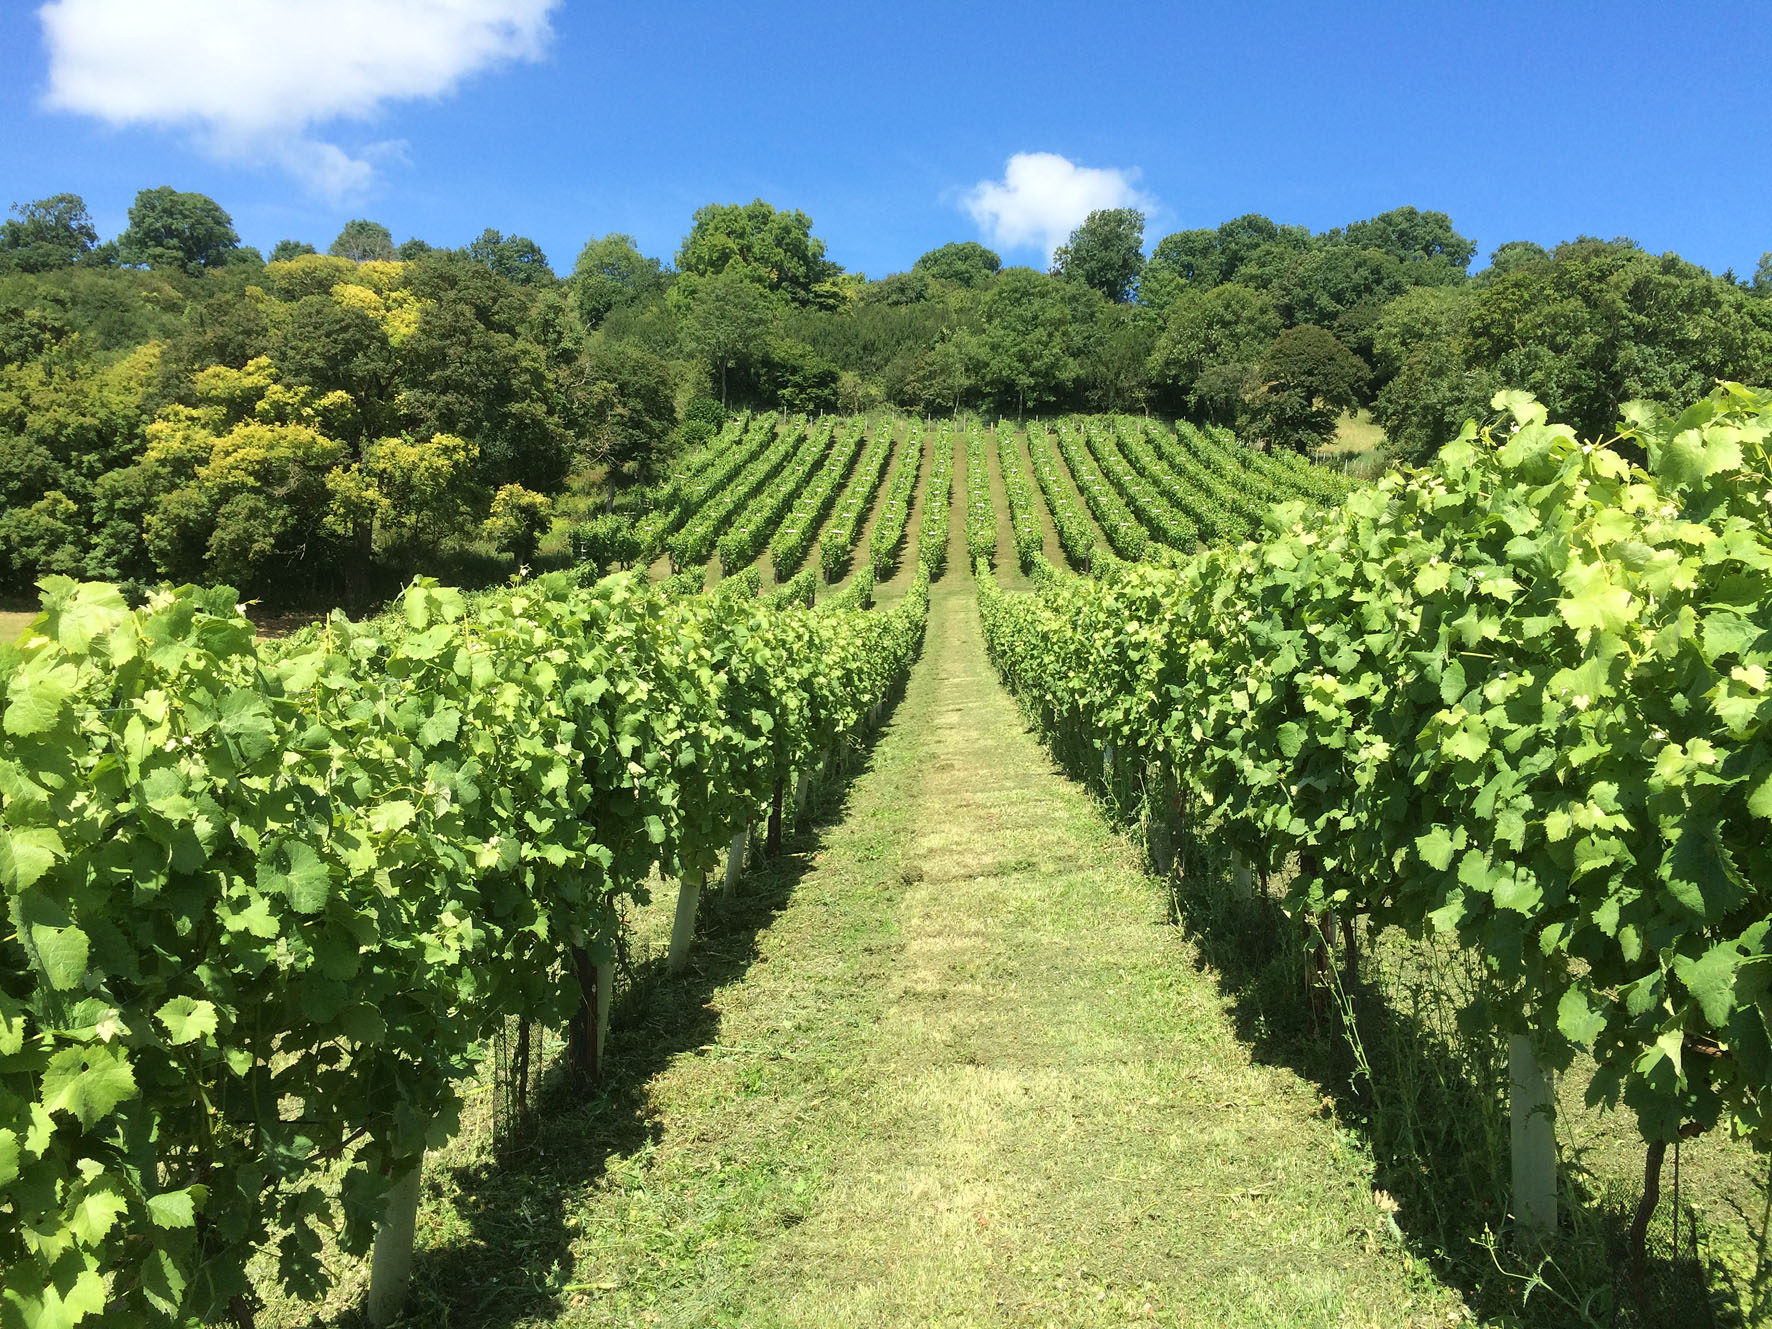 Vineyard July16.jpg